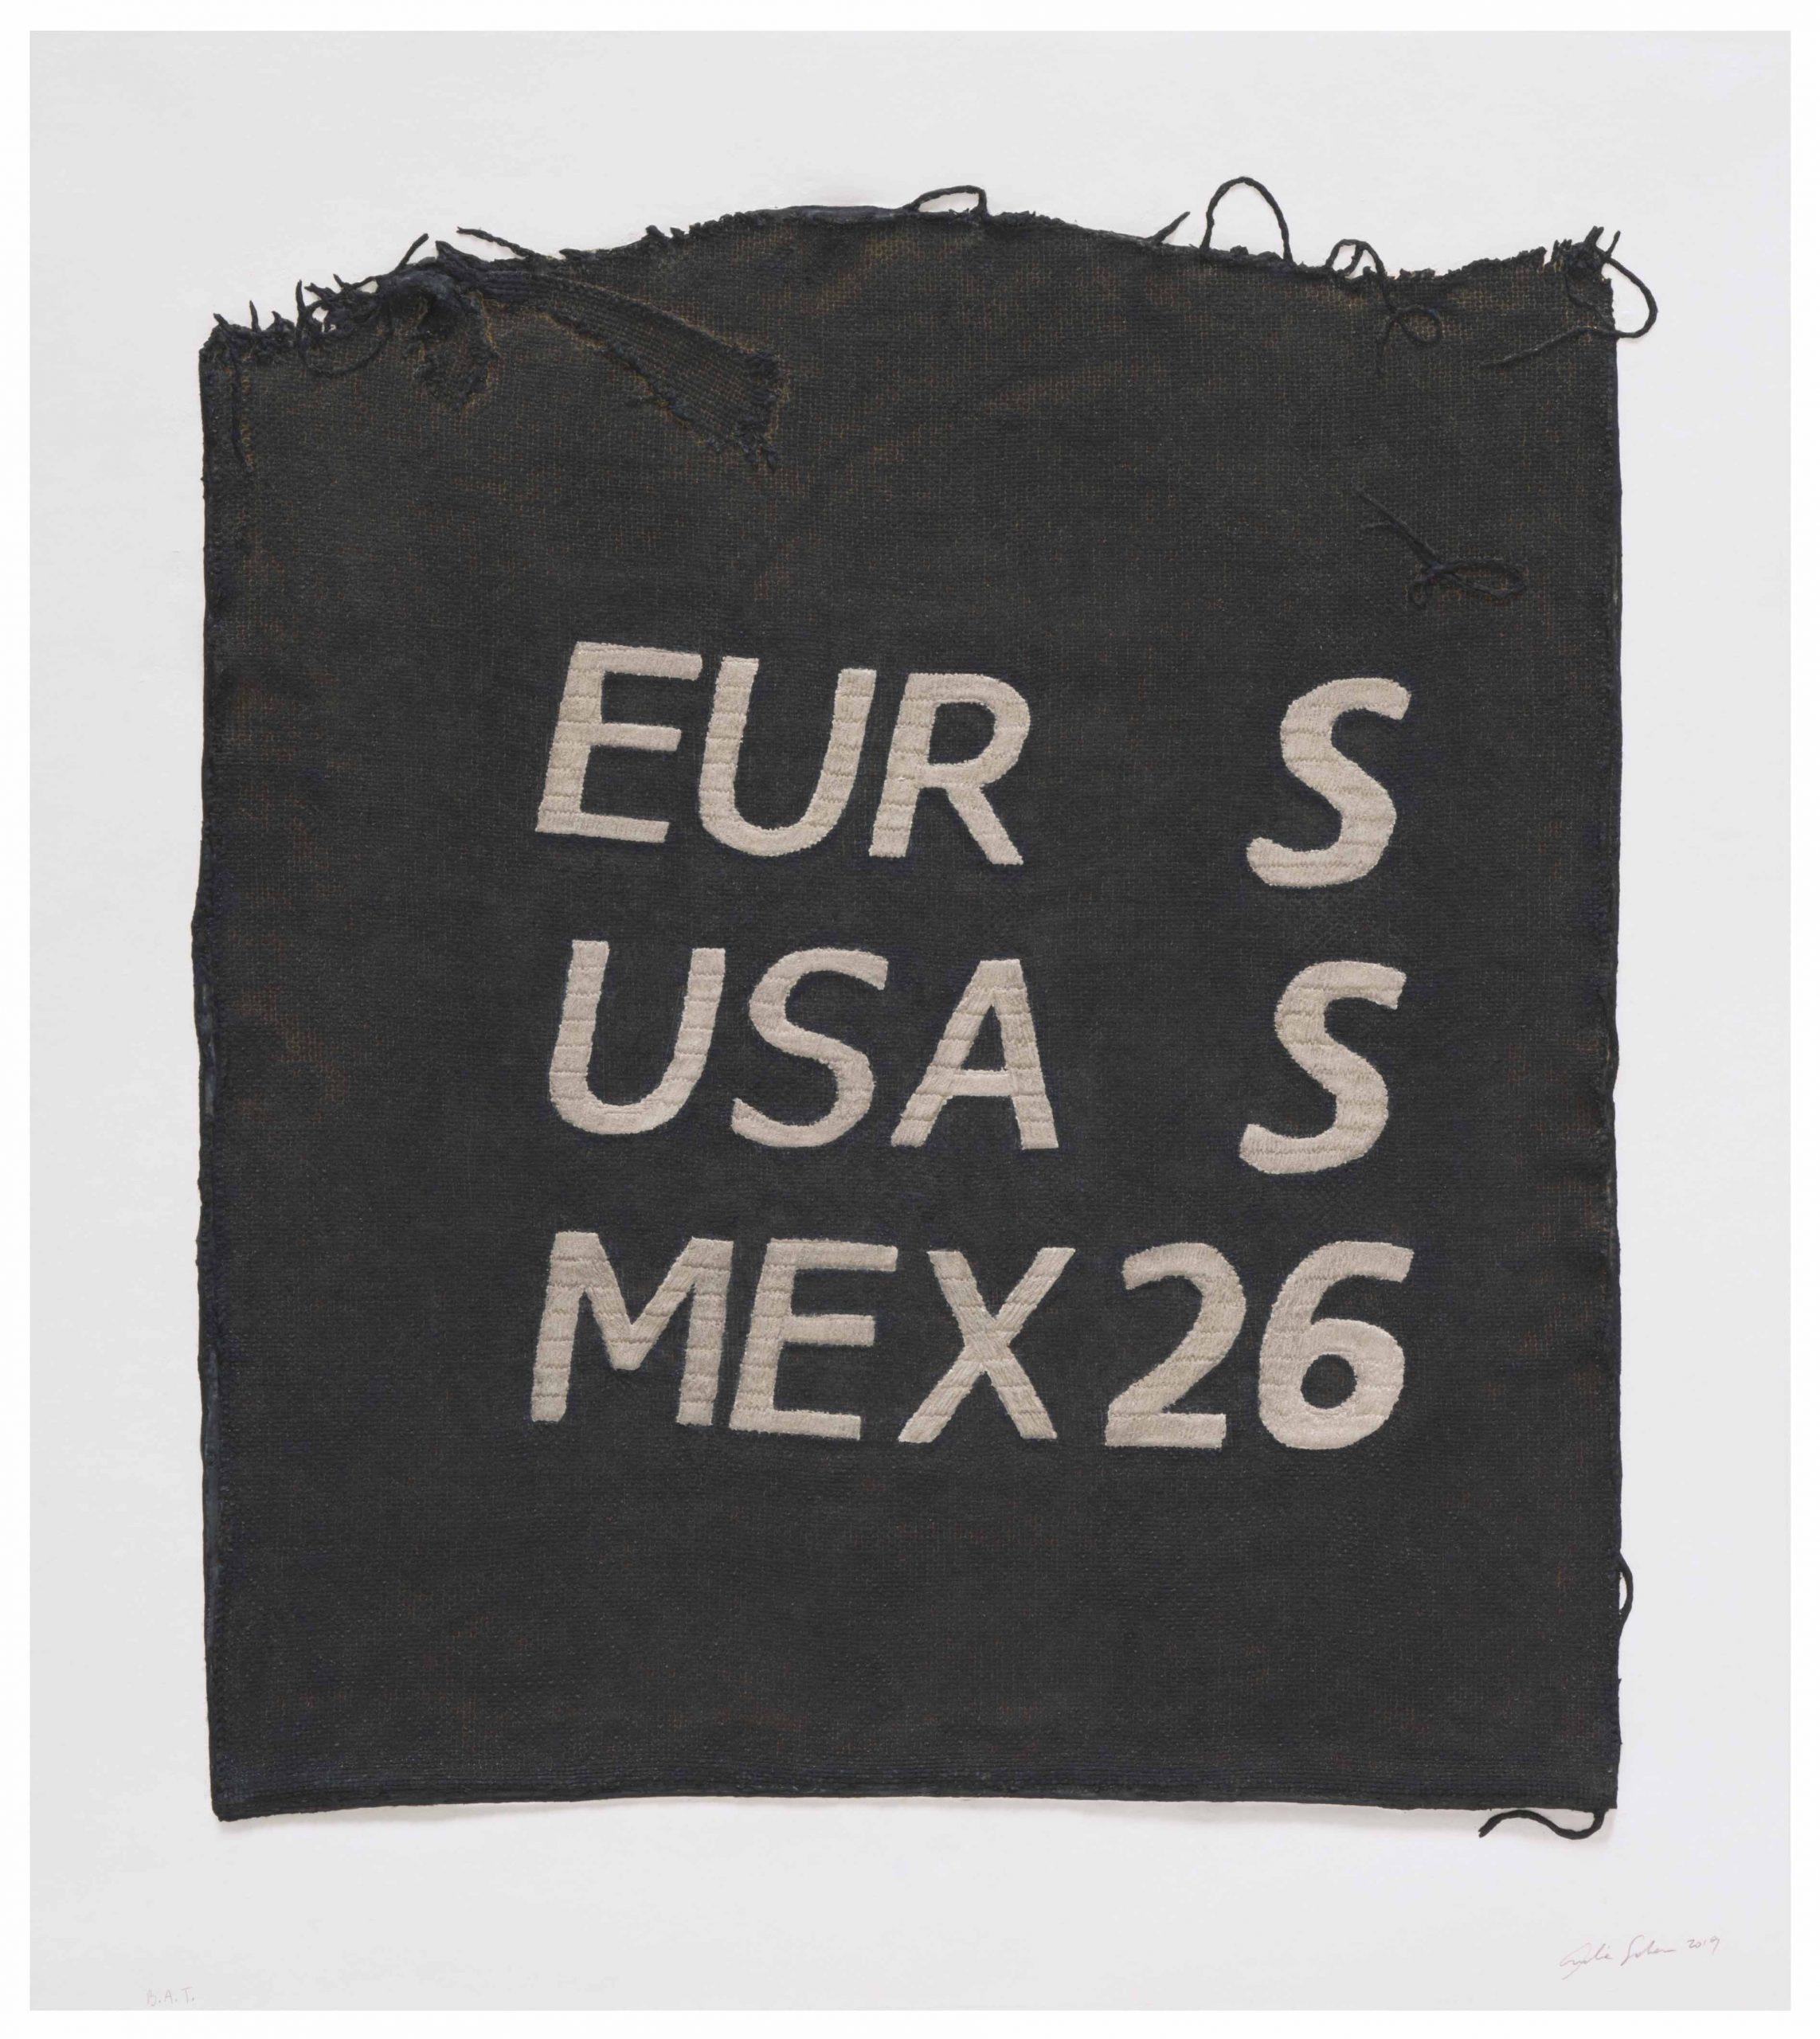 Eur S, Usa S, Mex 26, Clothing Tag by Analia Saban